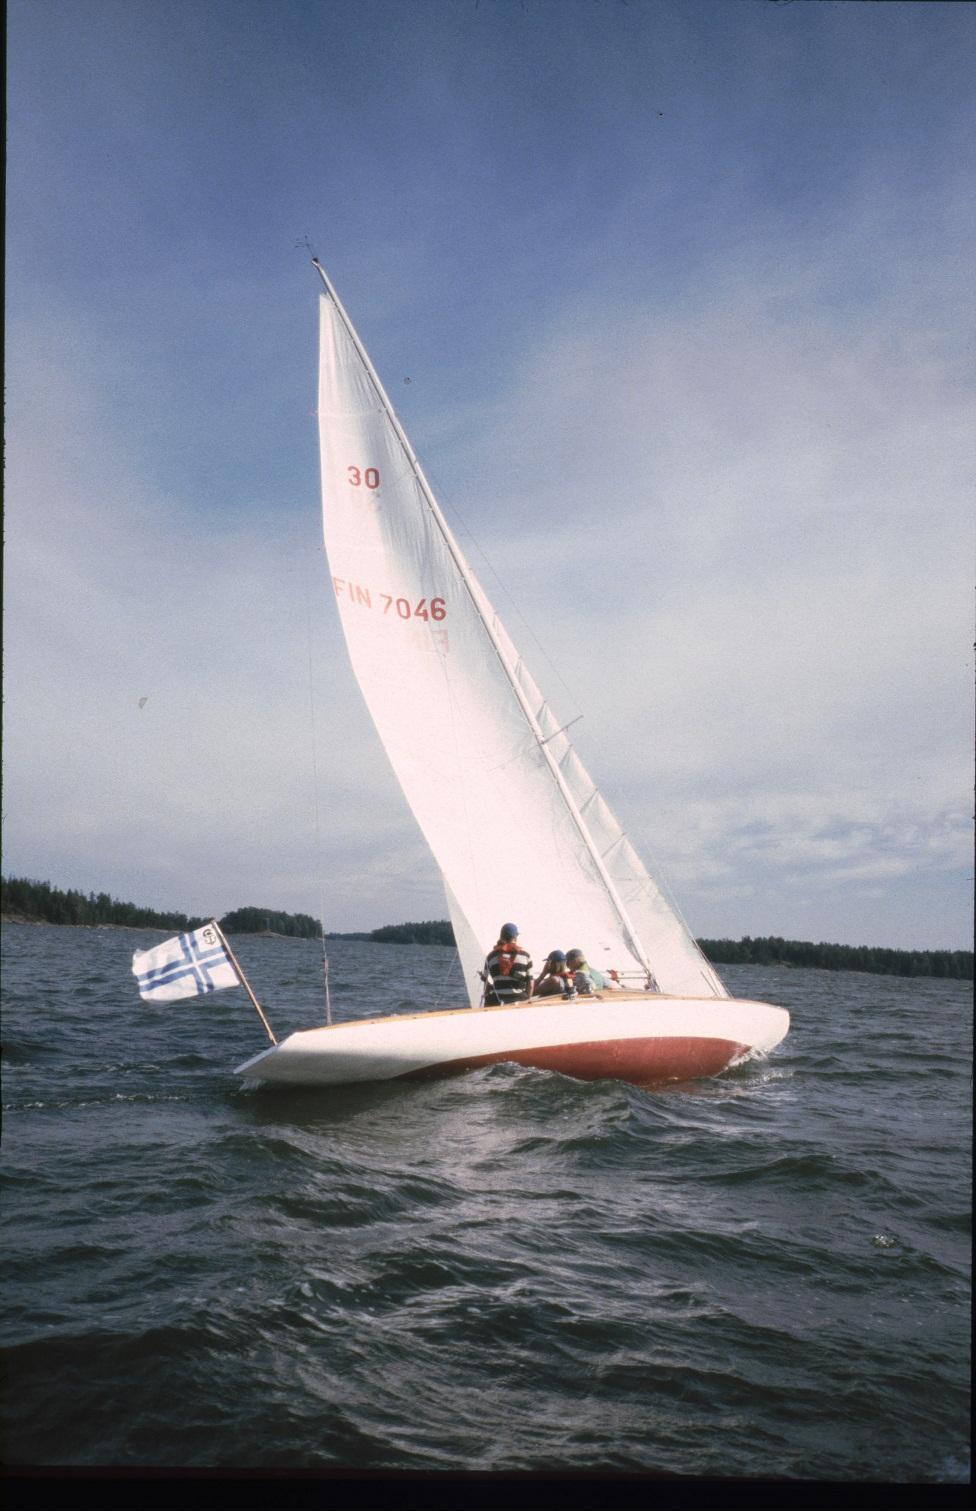 SK30 Slaghöken FIN-7046